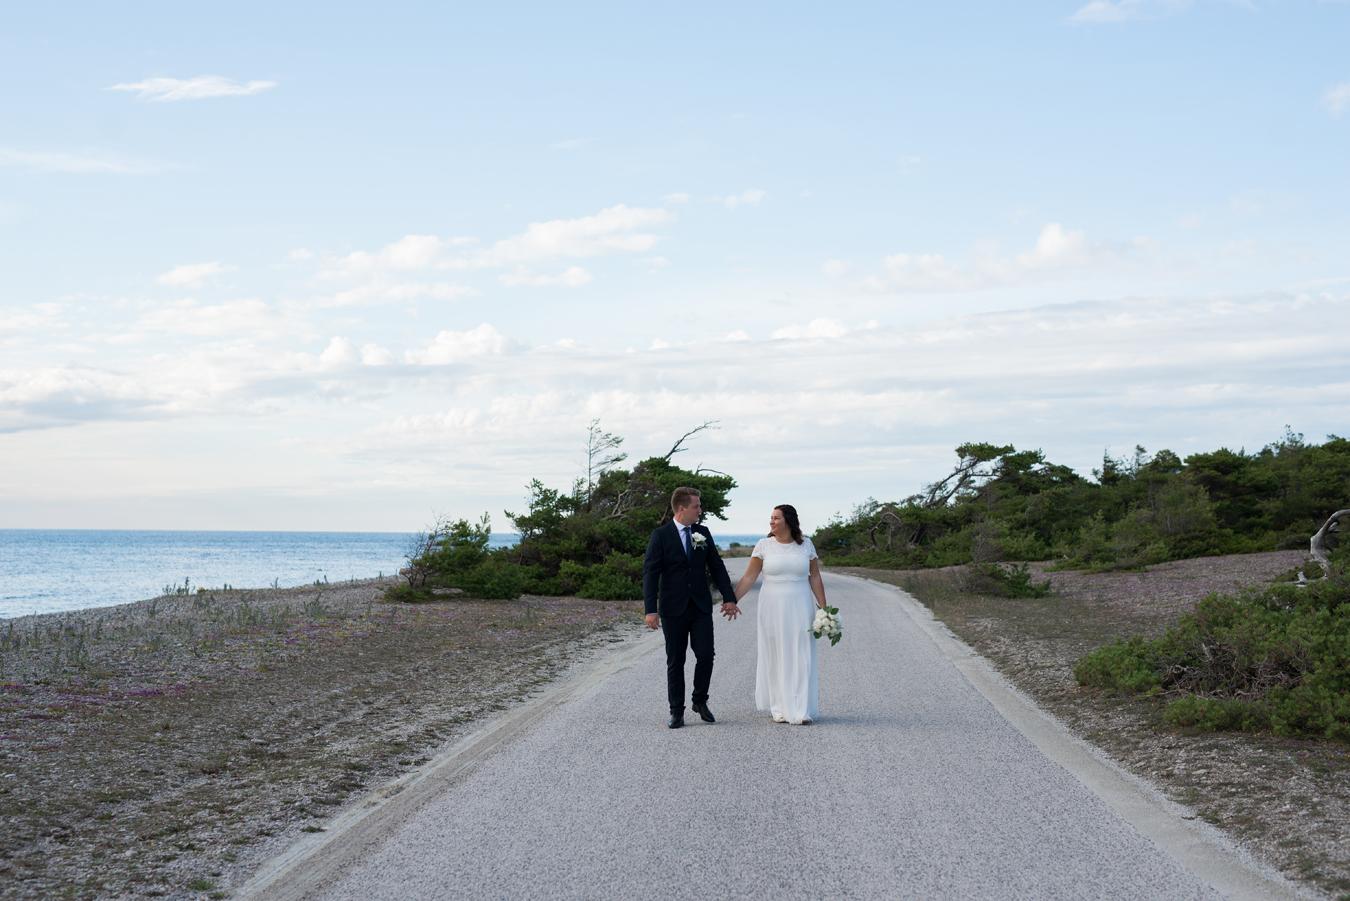 099-bröllopsfotograf-gotland-ekstakusten-neas-fotografi.jpg